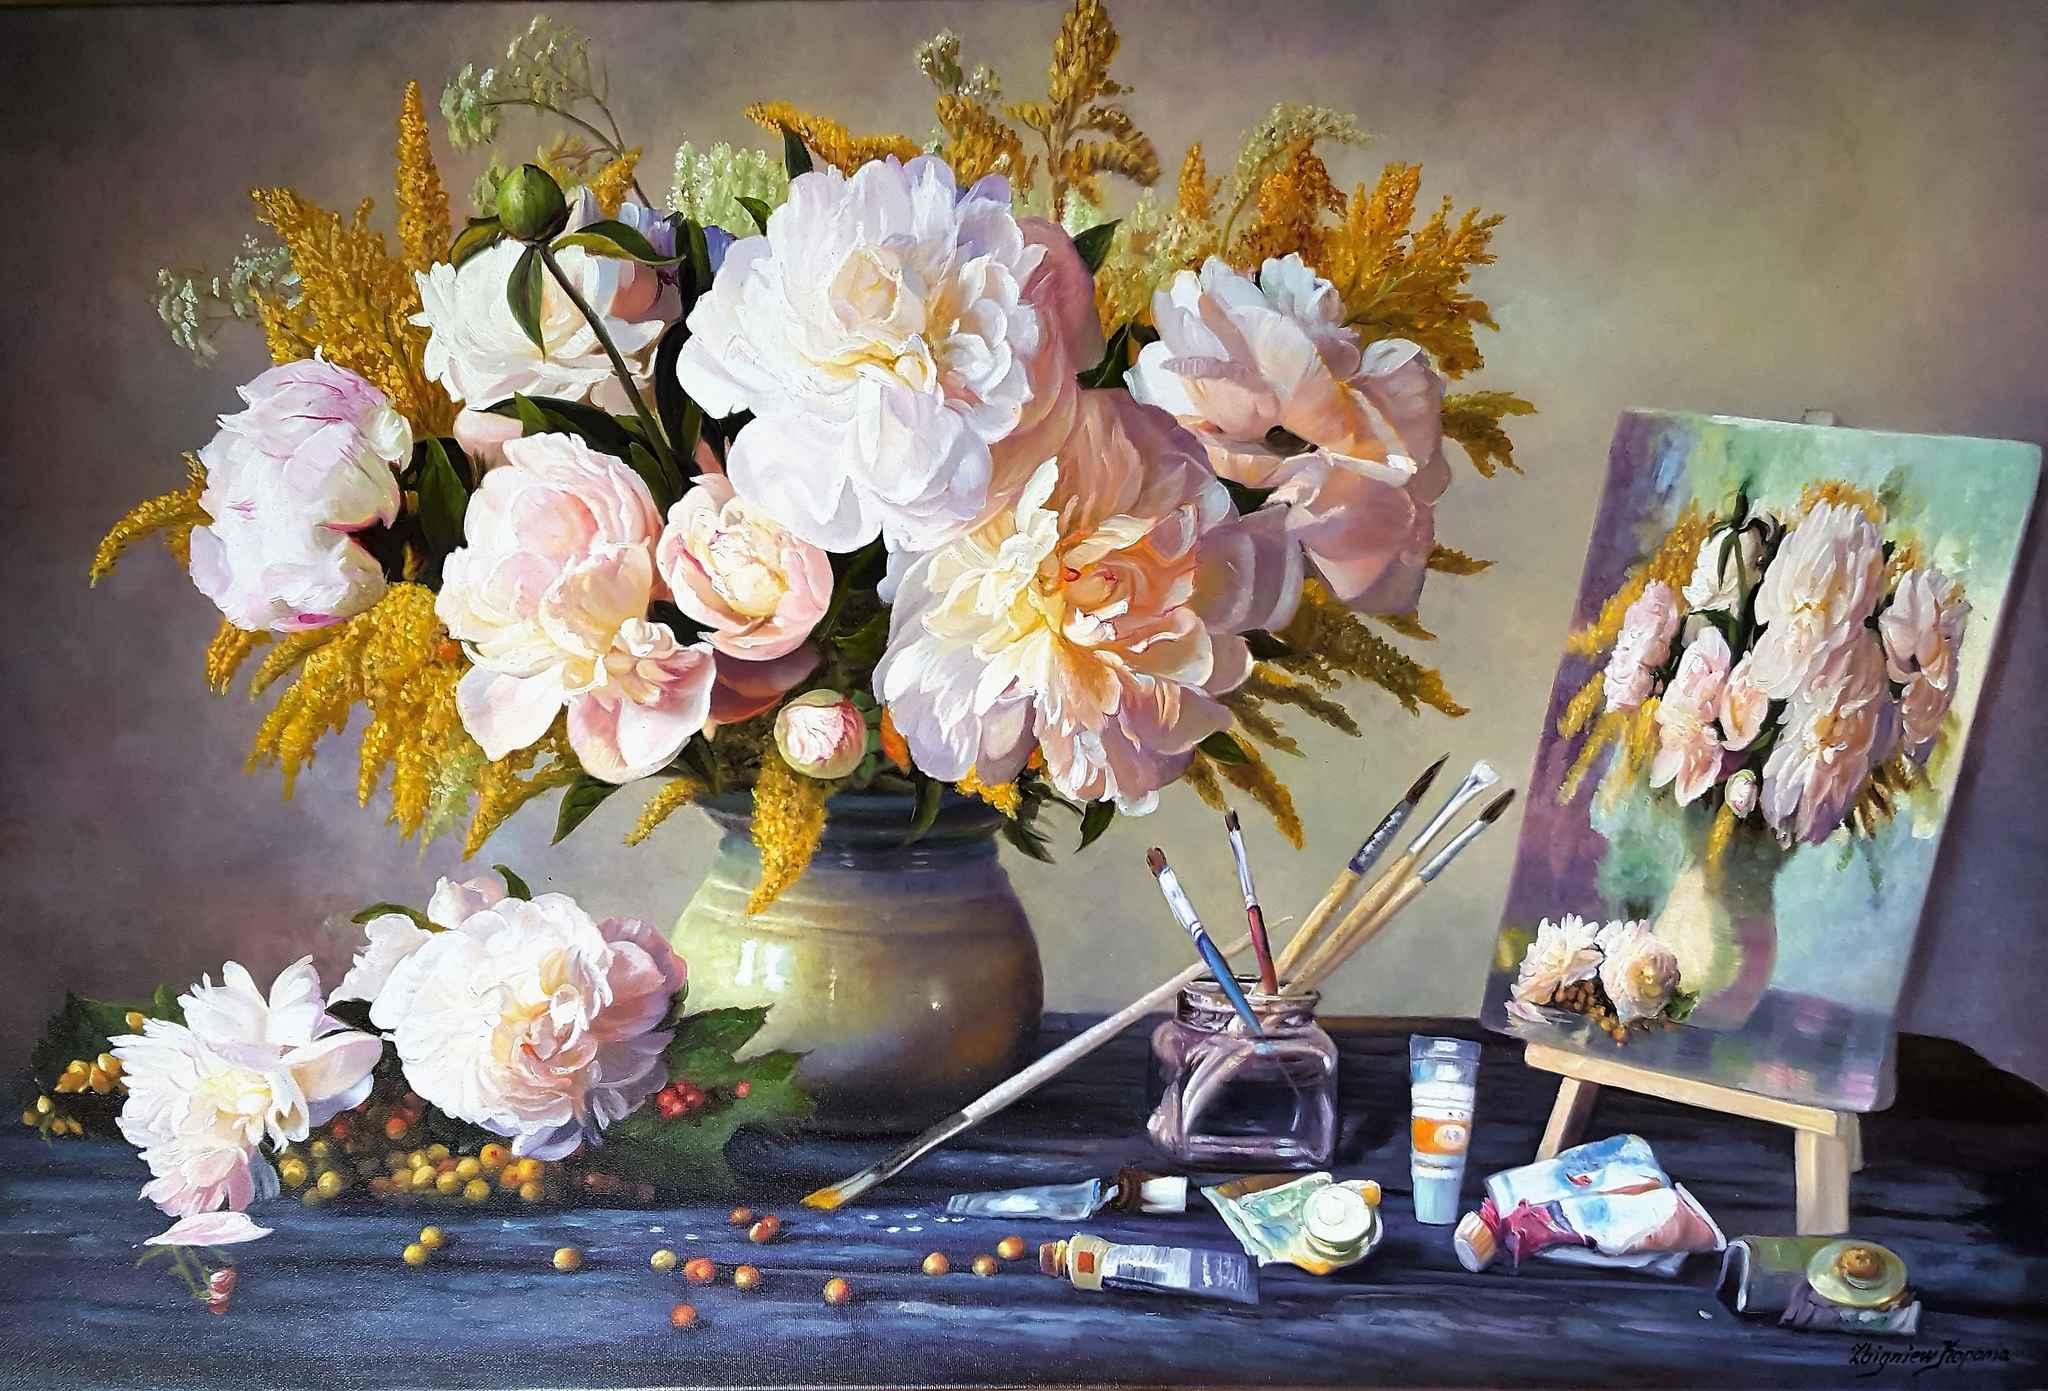 Martwa natura - bukiet kwiatów, 2017